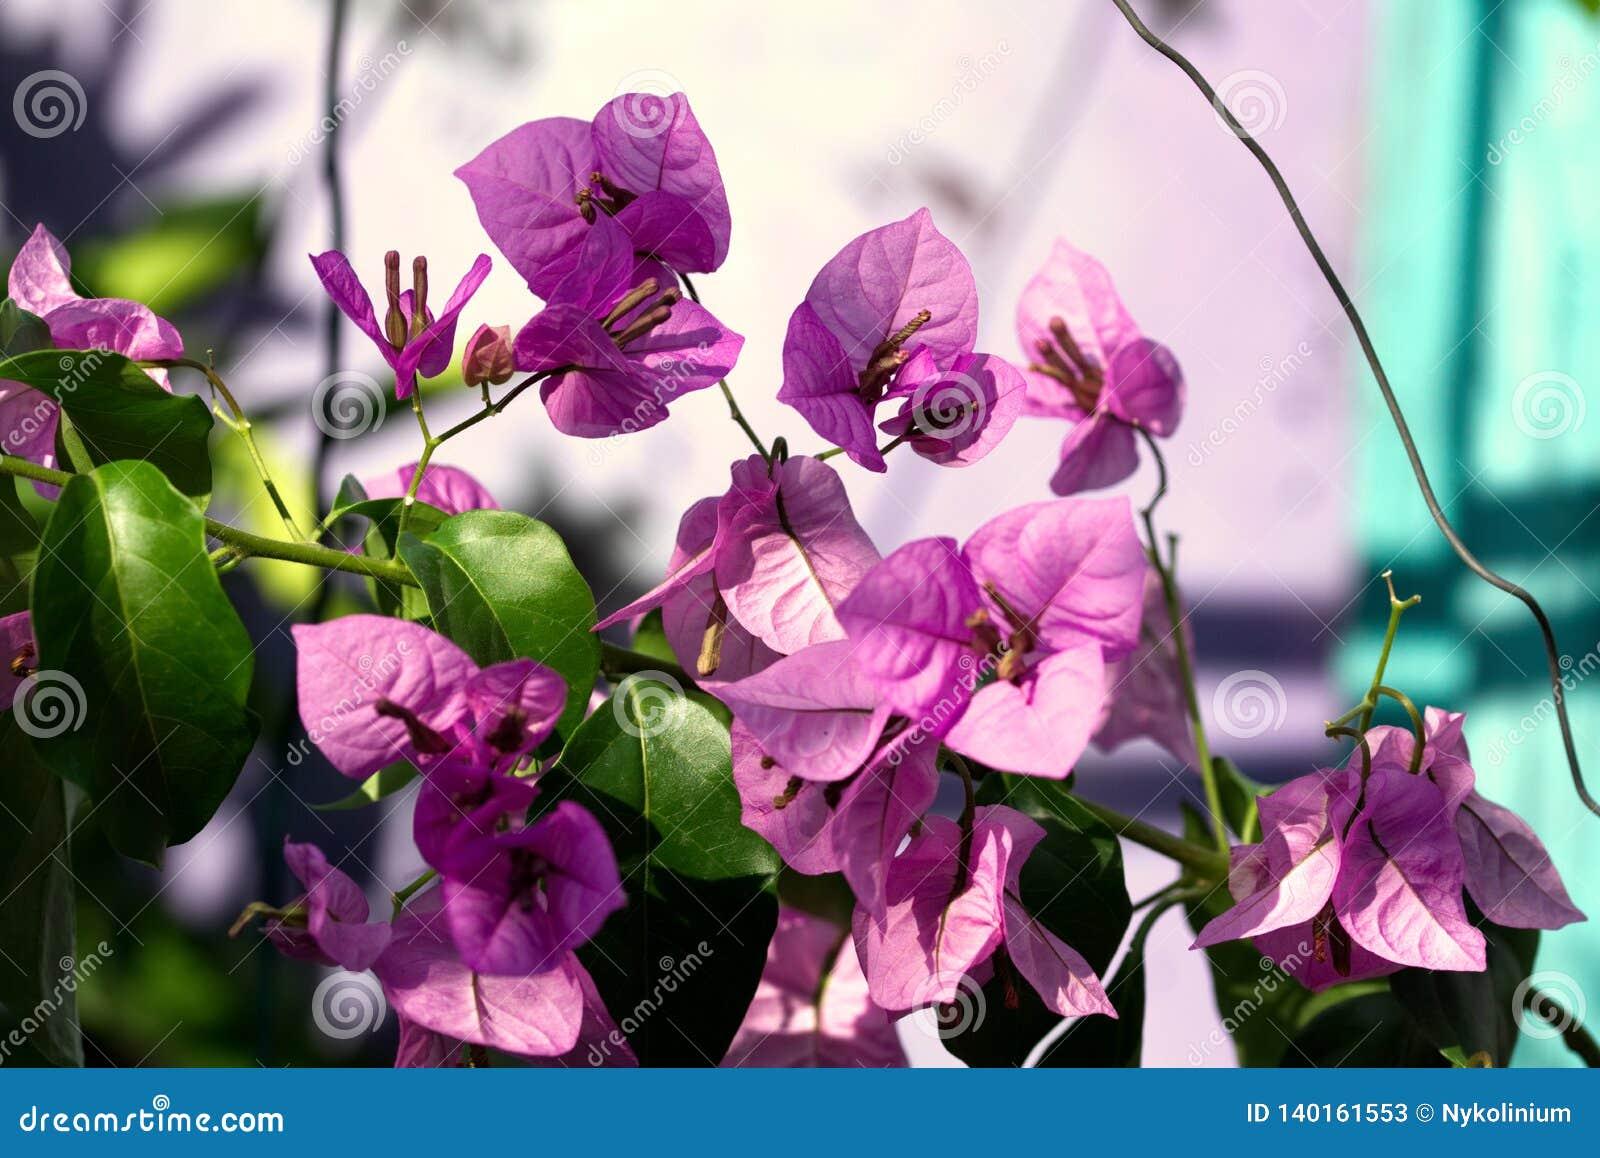 Bougainvilleabloemen in de tuin